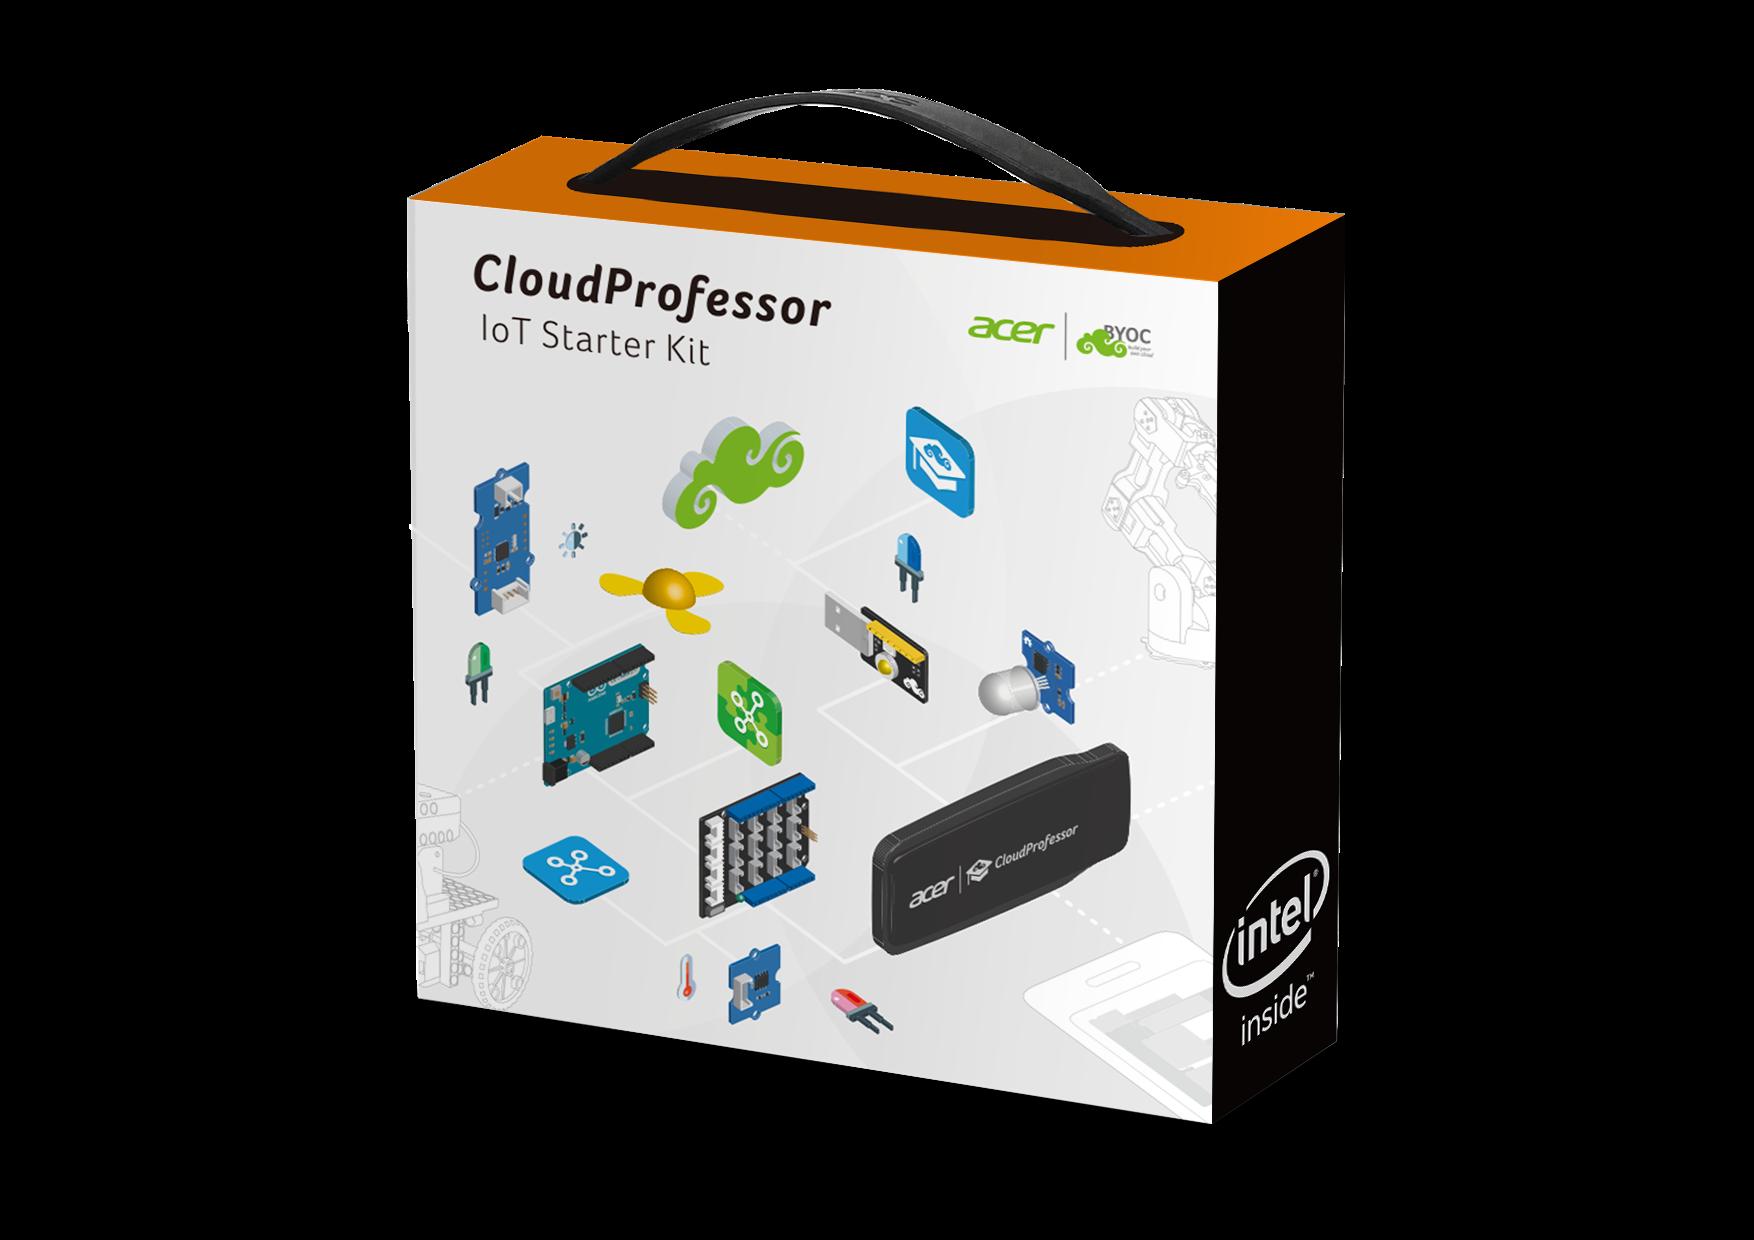 CloudProfessor 1